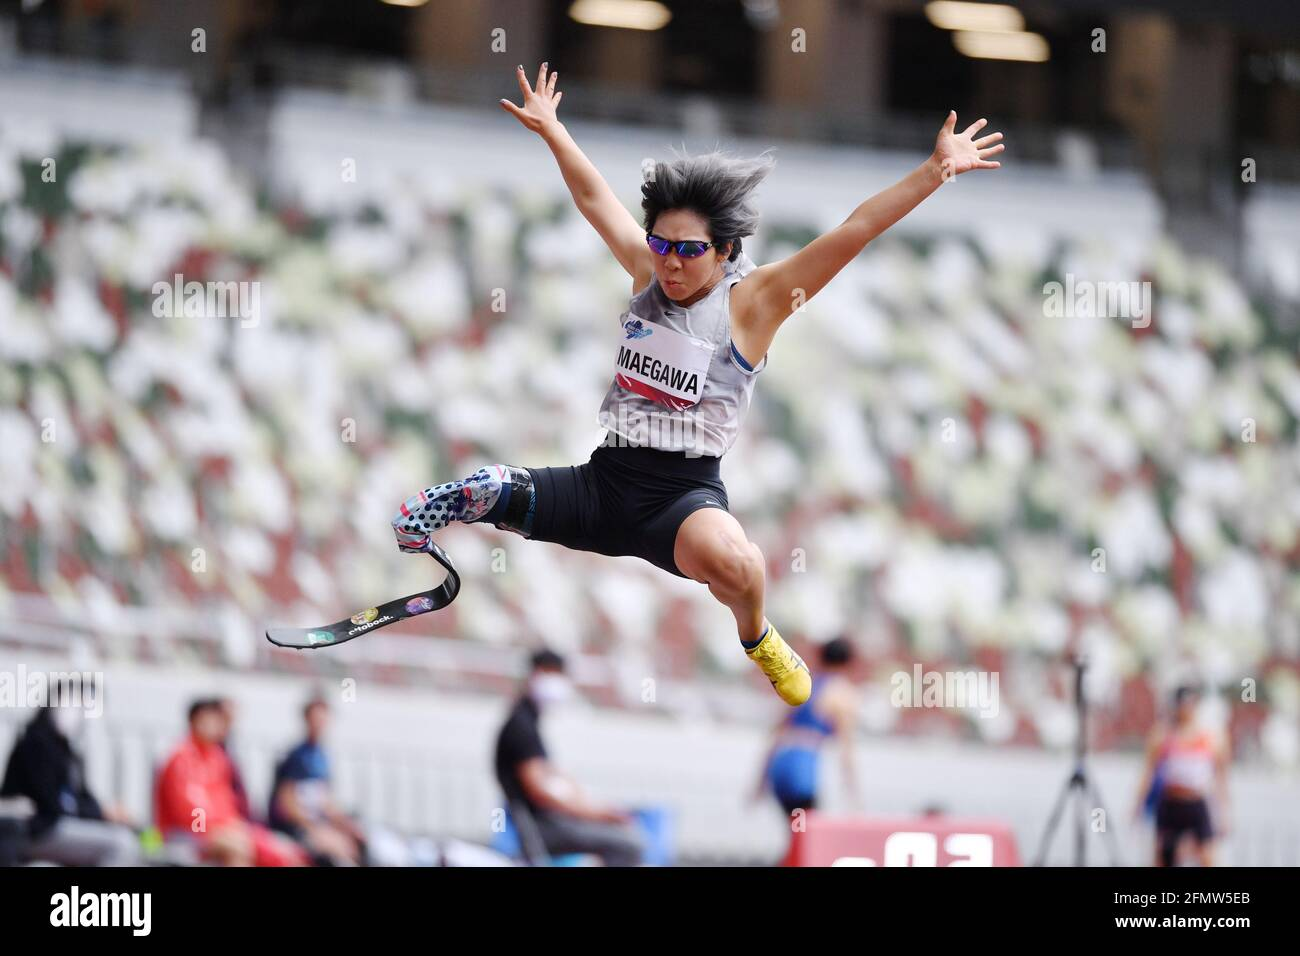 Kaede Maegawa, 11 MAGGIO 2021 - Para Athletics : READY STEADY TOKYO - Para Athletics Women's Long Jump T63 Final al National Stadium di Tokyo, Giappone. (Foto di MATSUO.K/AFLO SPORT) Foto Stock